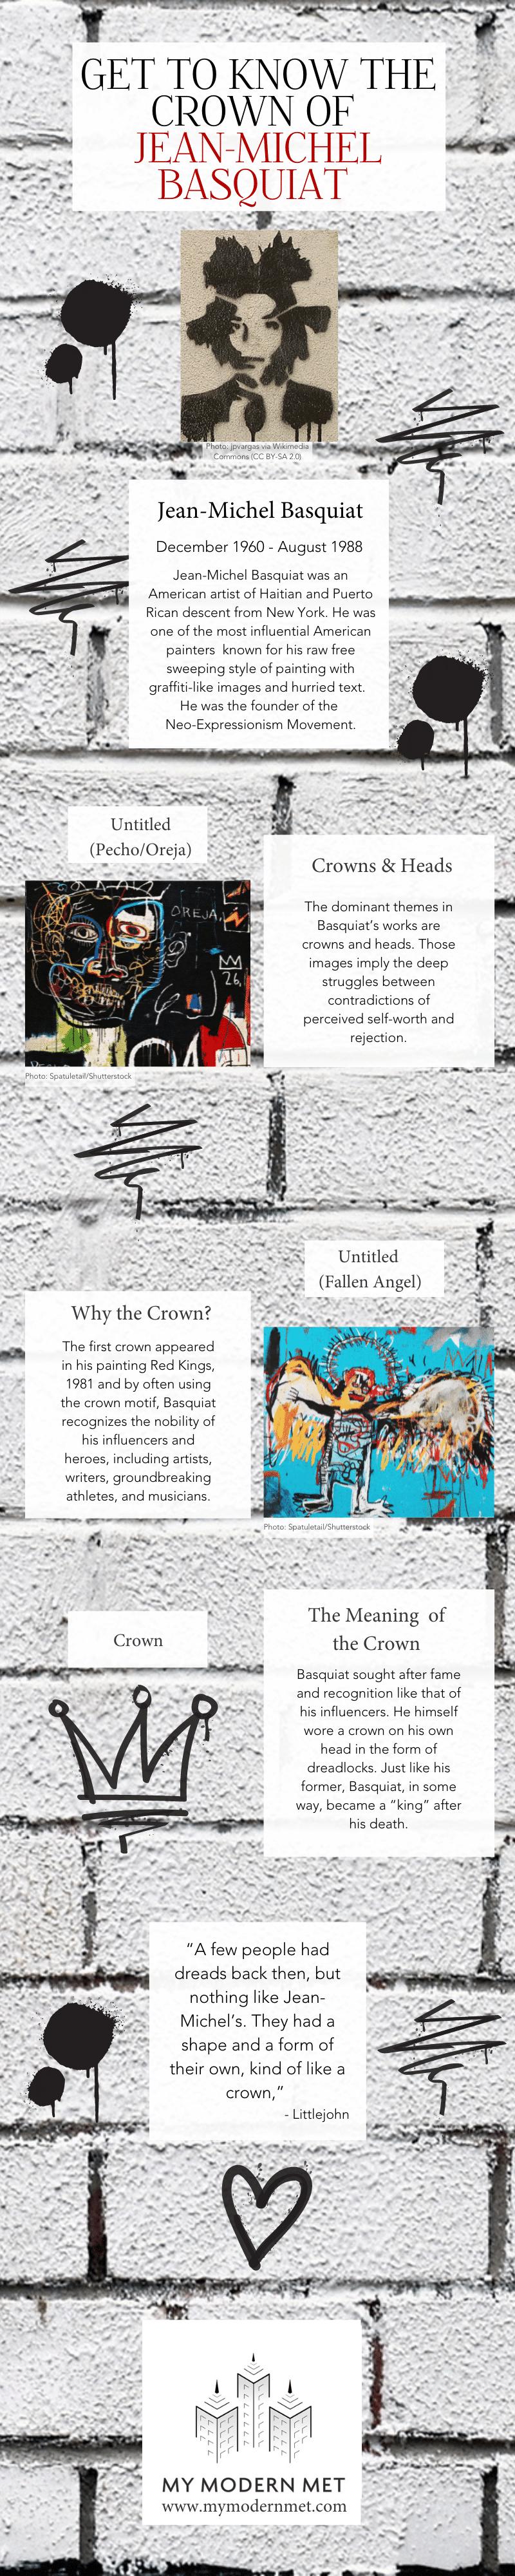 Jean-Michel Basquiat Infographic